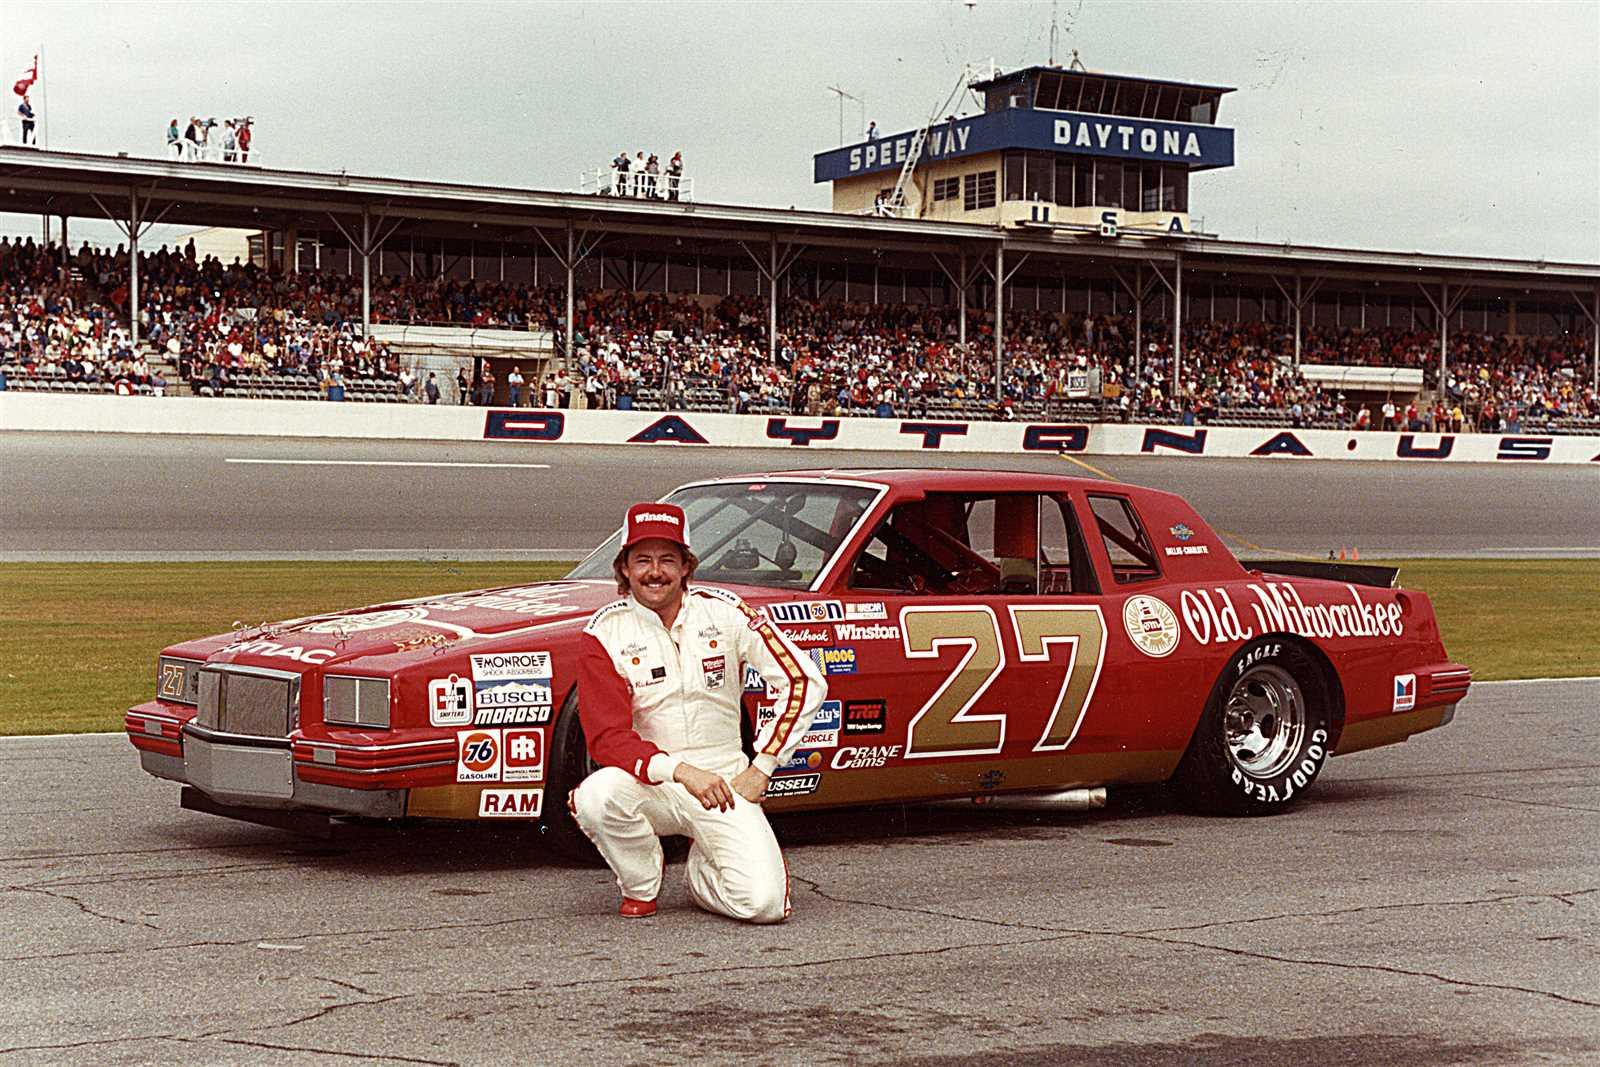 Former NASCAR driver Tim Richmond outside of his car at Daytona International Speedway